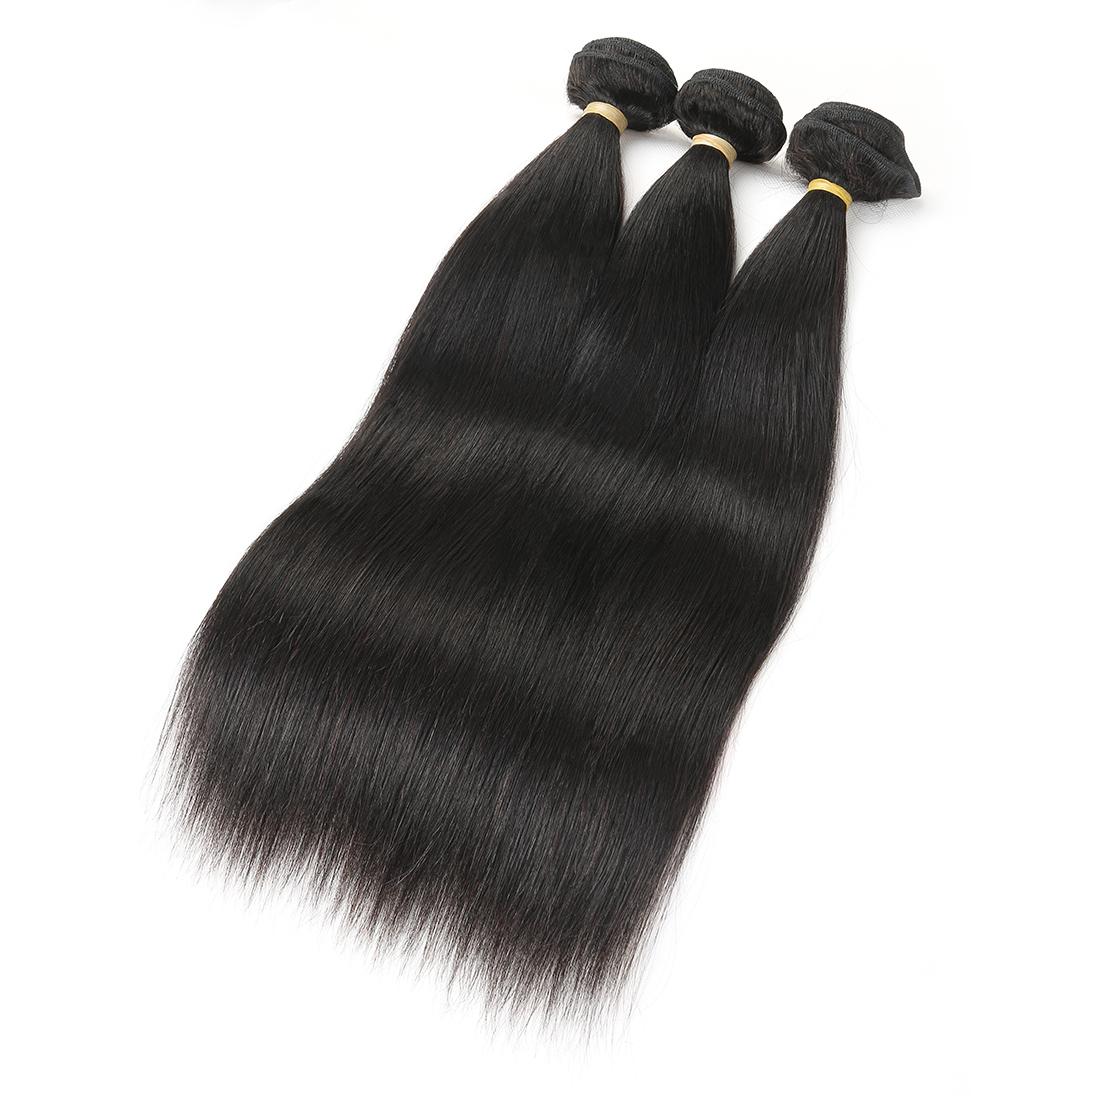 9A Indian Straight 4 Bundles Human Virgin Hair Weave